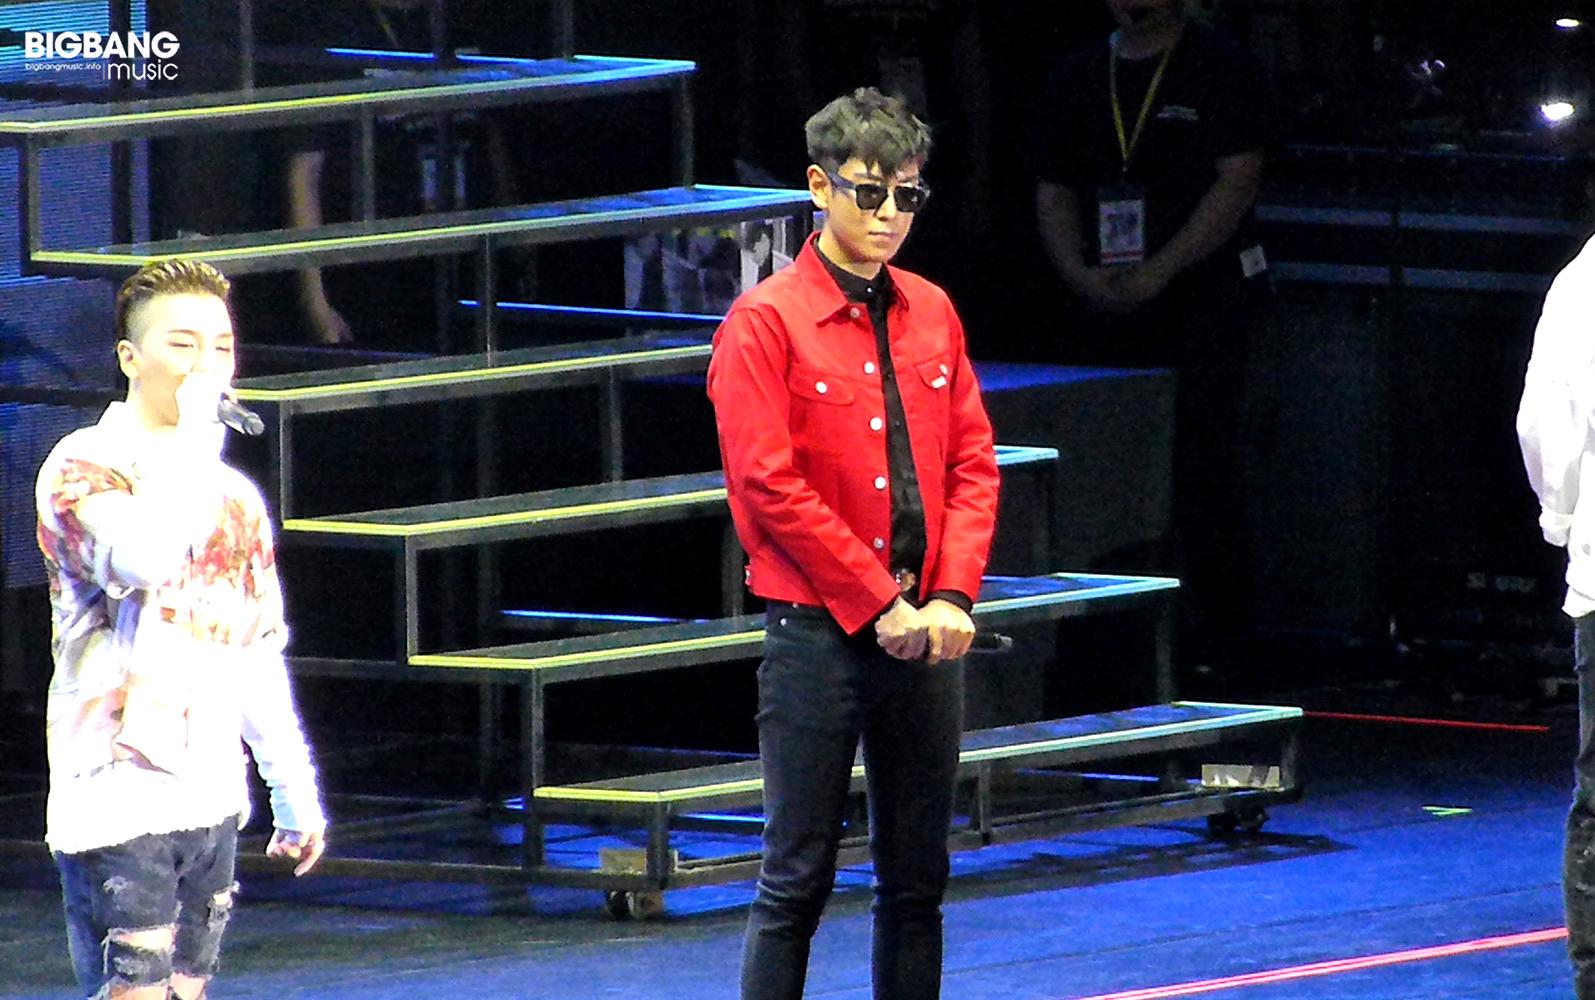 BIGBANGmusic-BIGBANG-FM-Hong-Kong-Day-2-2016-07-23-03